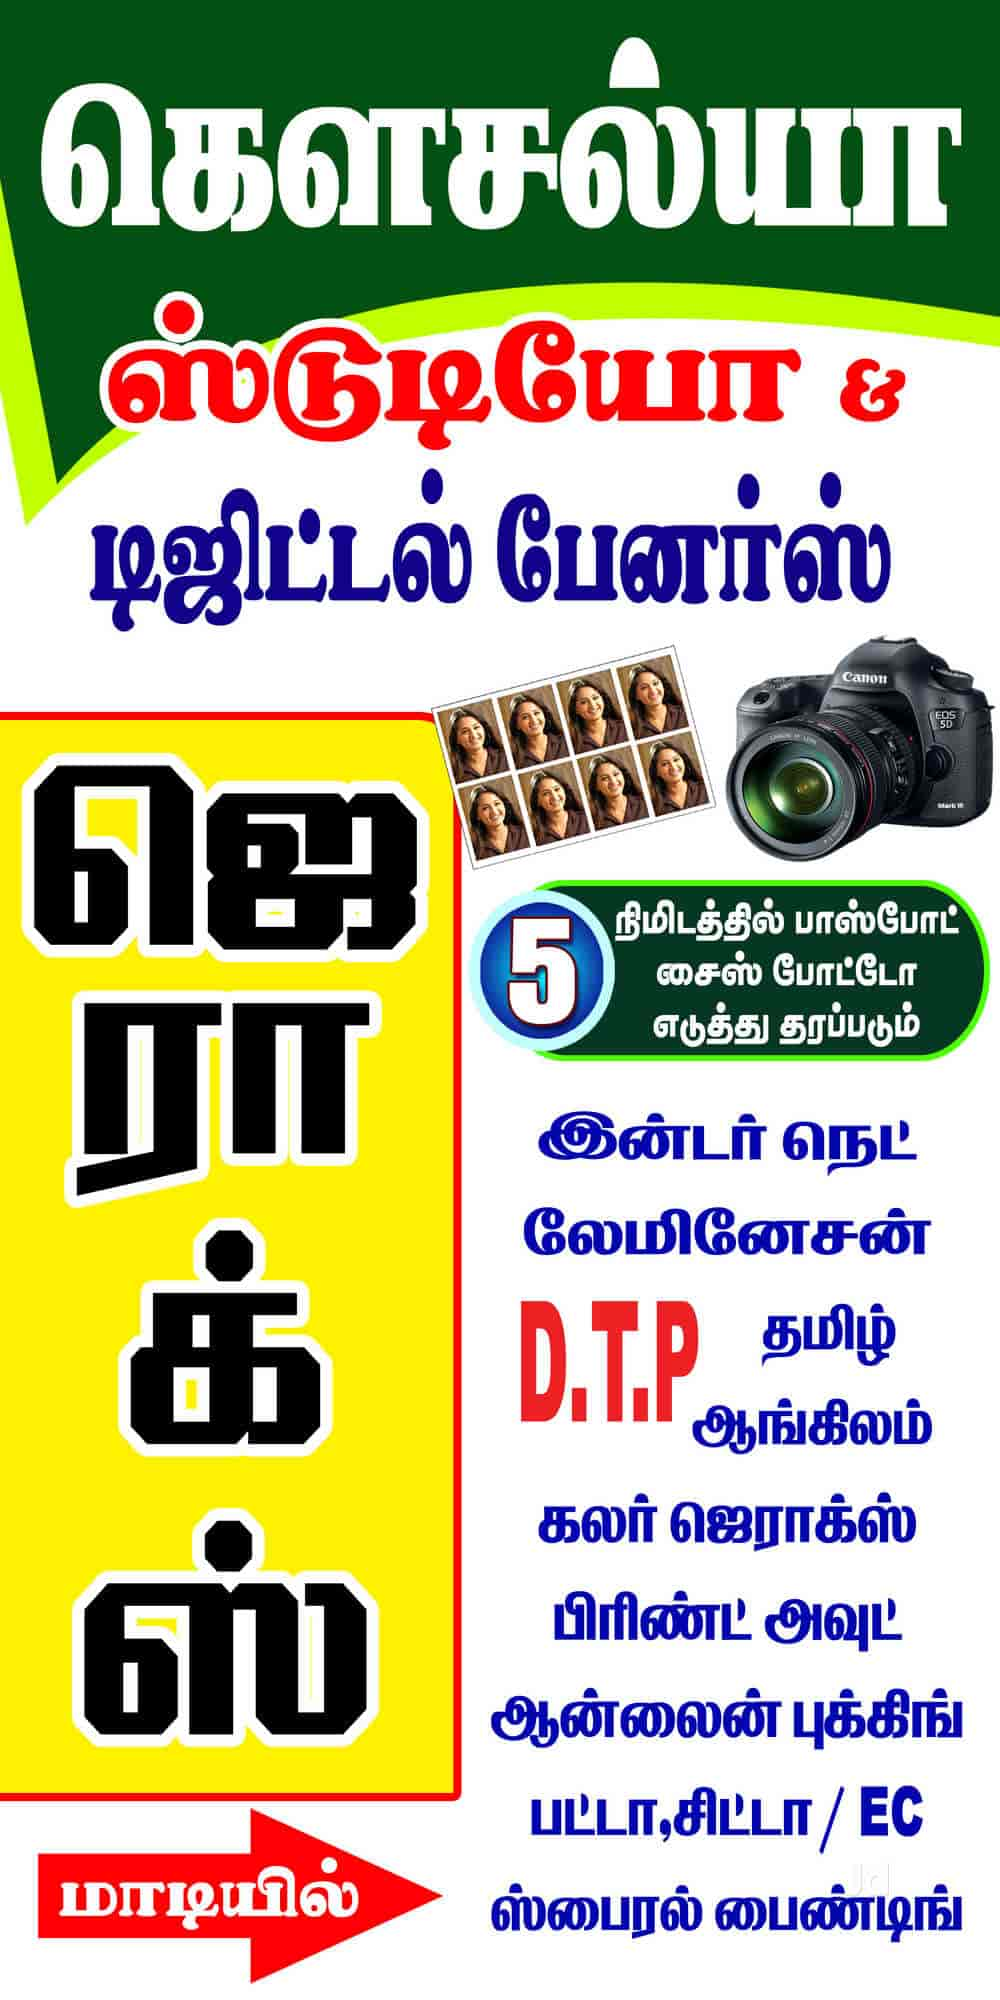 Kowsalya Classic Digital Studio Digital Banner Photo Studios In Kanchipuram Justdial